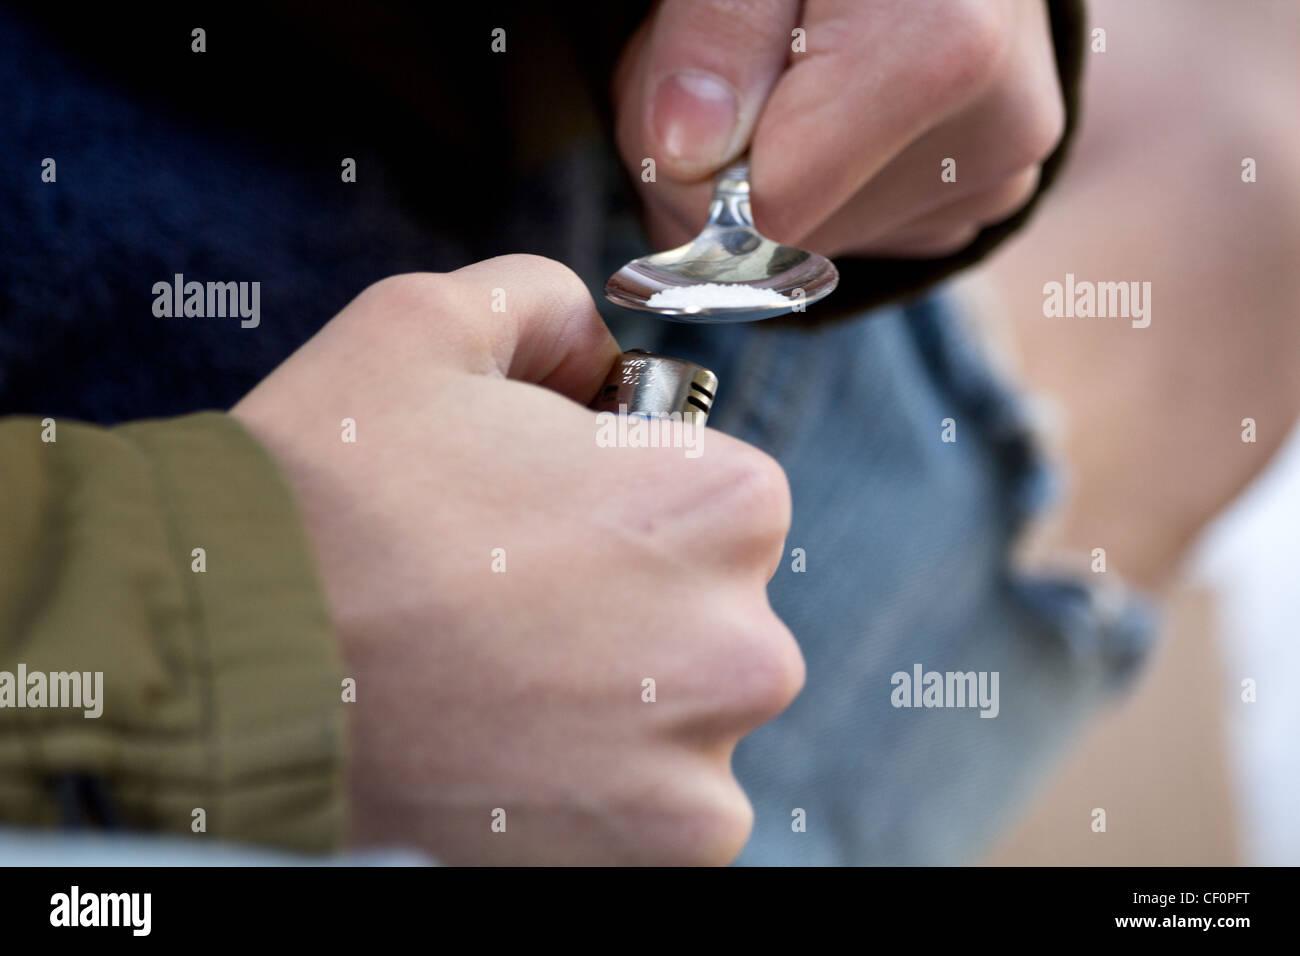 Close up of drug addicted homeless man preparing heroin - Stock Image